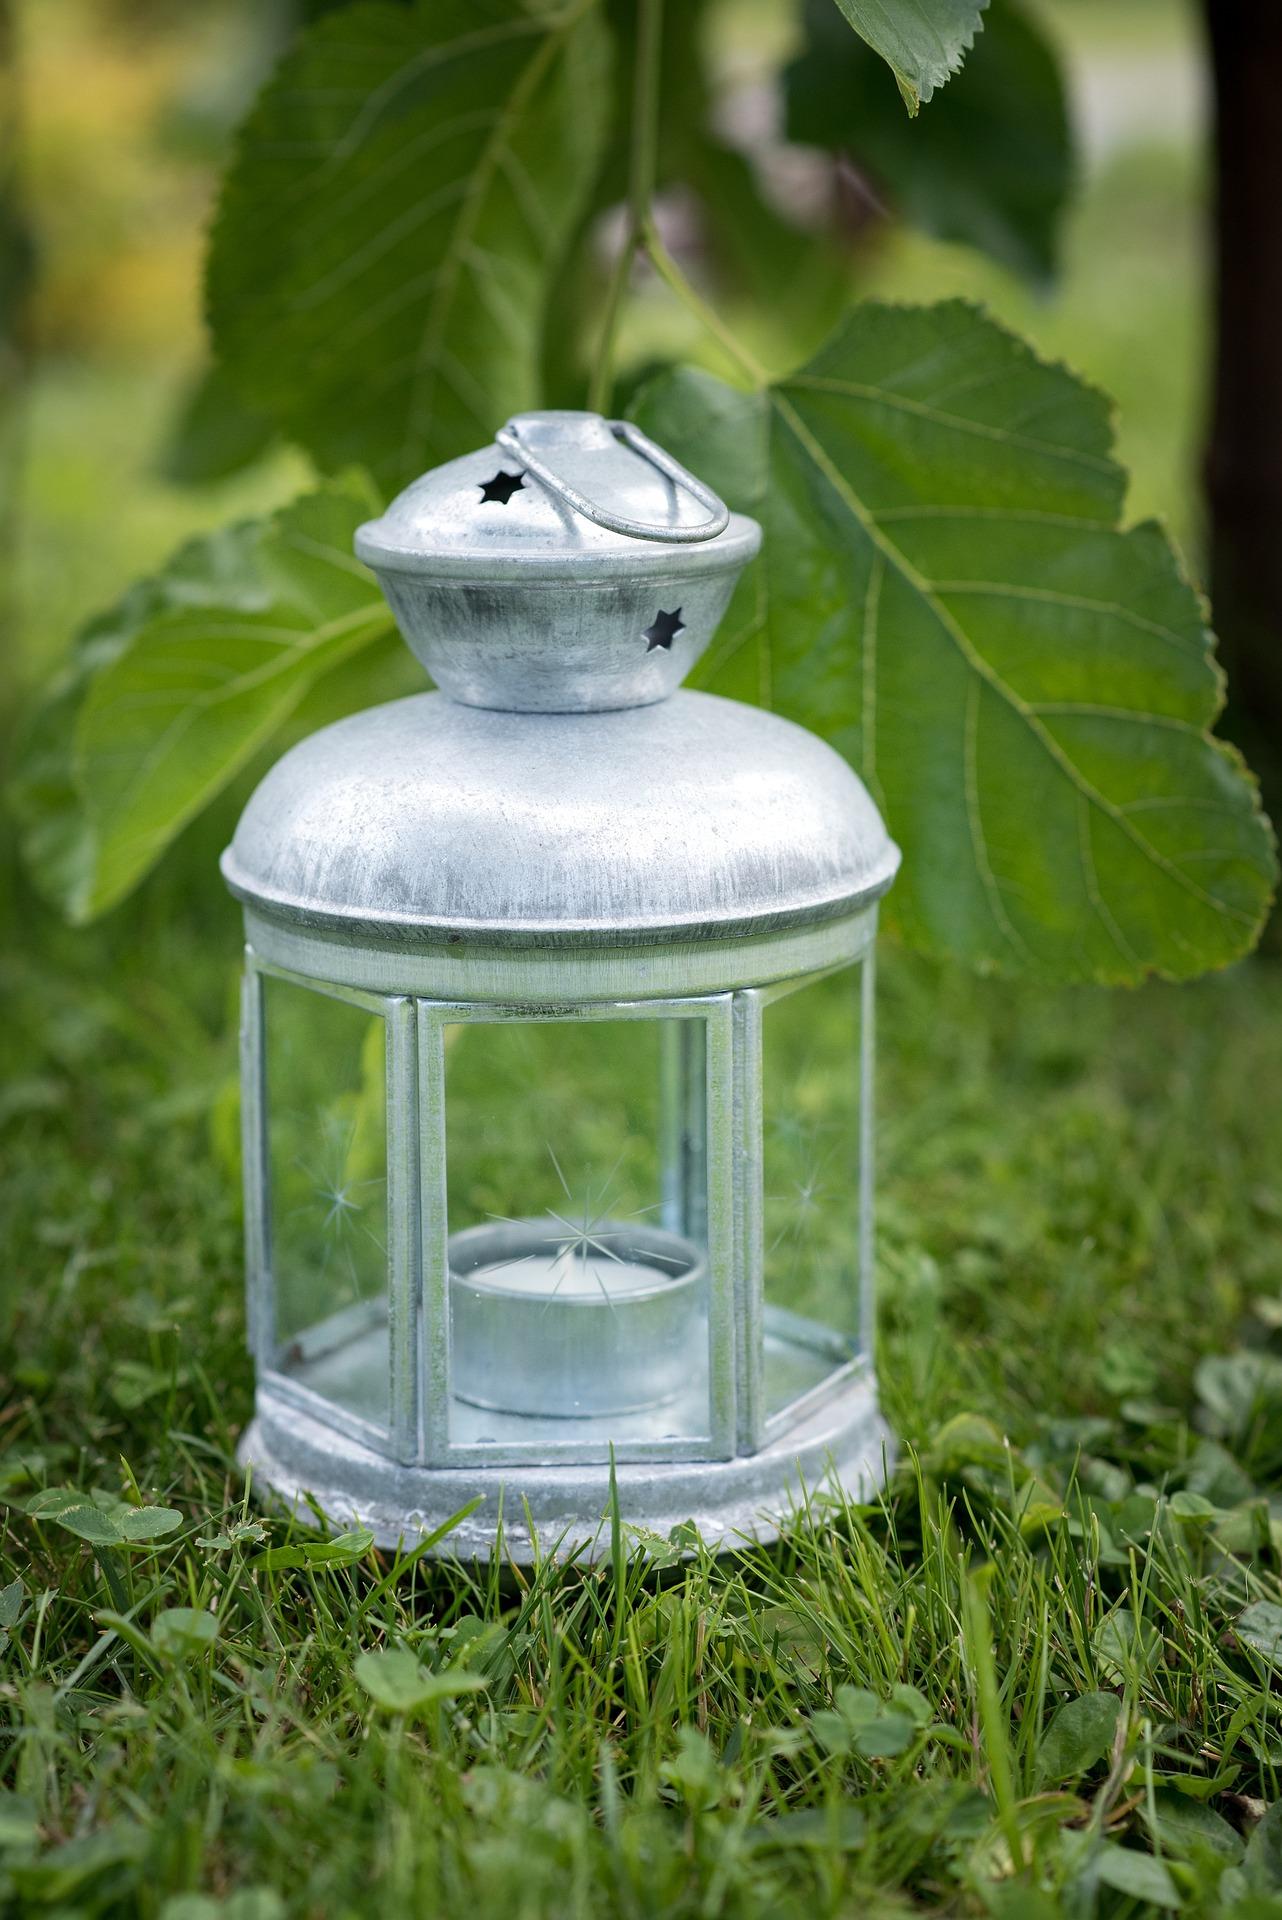 lantern-1419587_1920.jpg